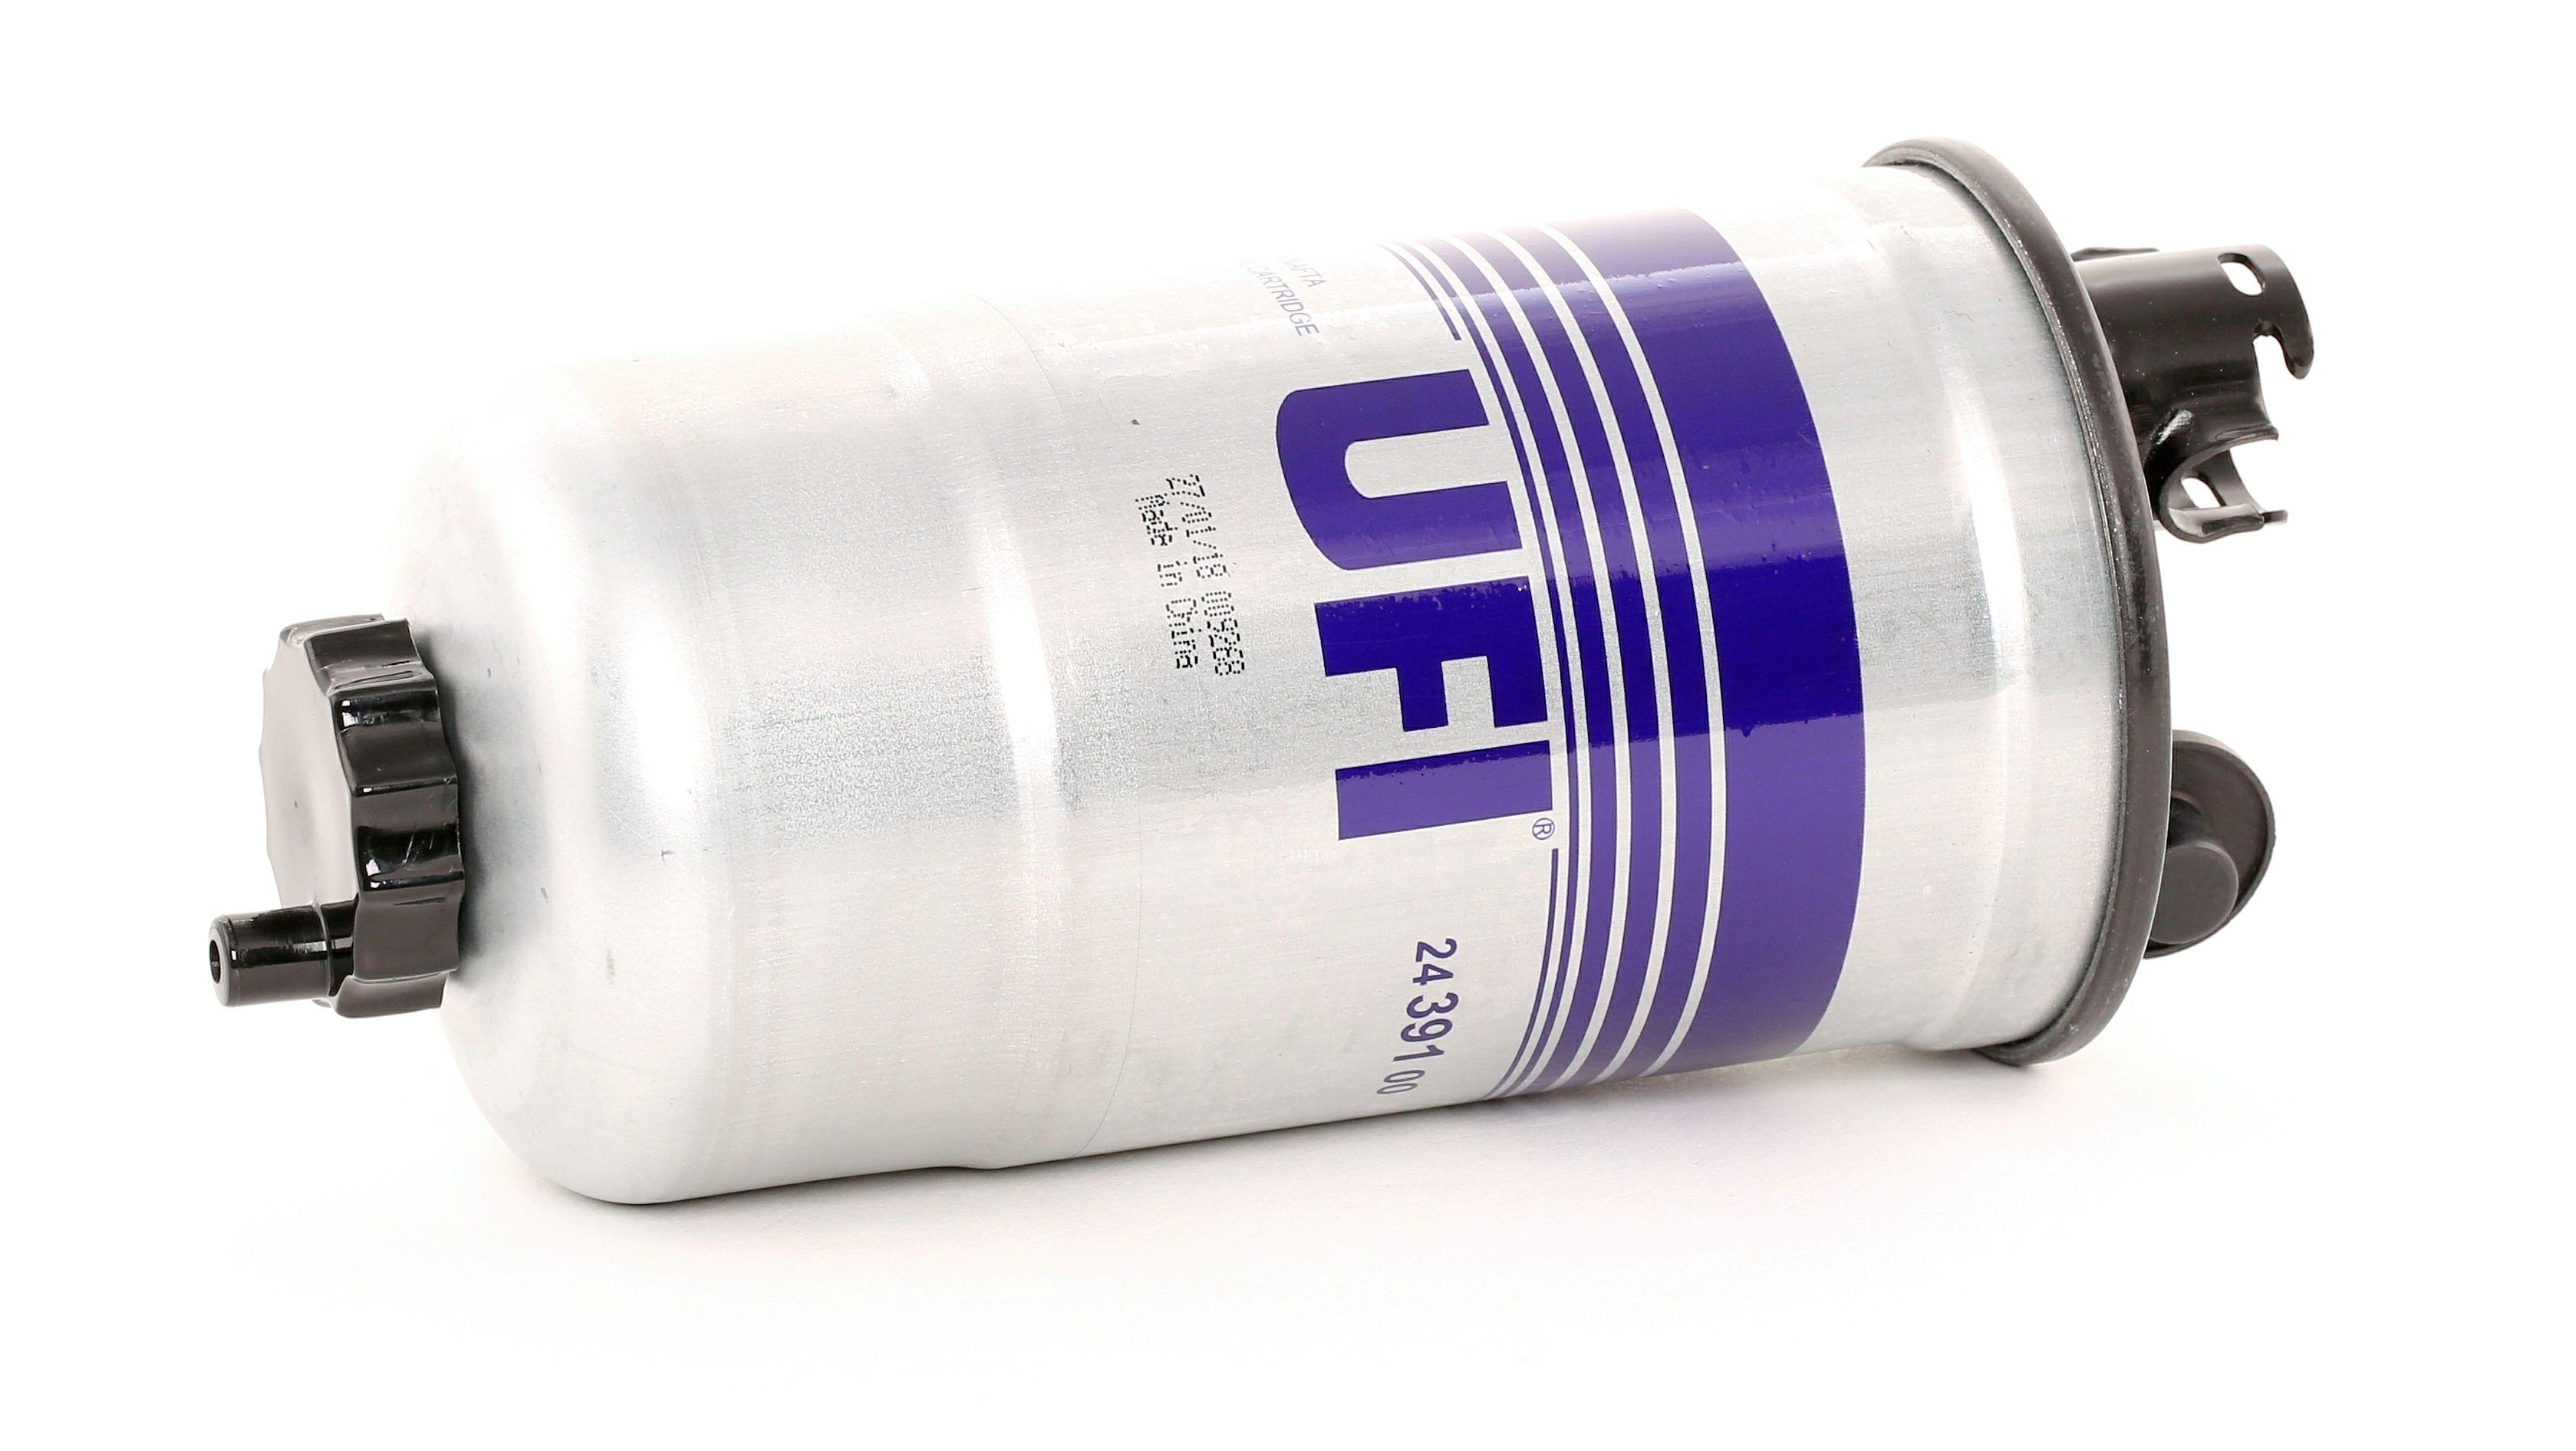 Osta 24.391.00 UFI Filtrer Kõrgus: 176,5mm Kütusefilter 24.391.00 madala hinnaga